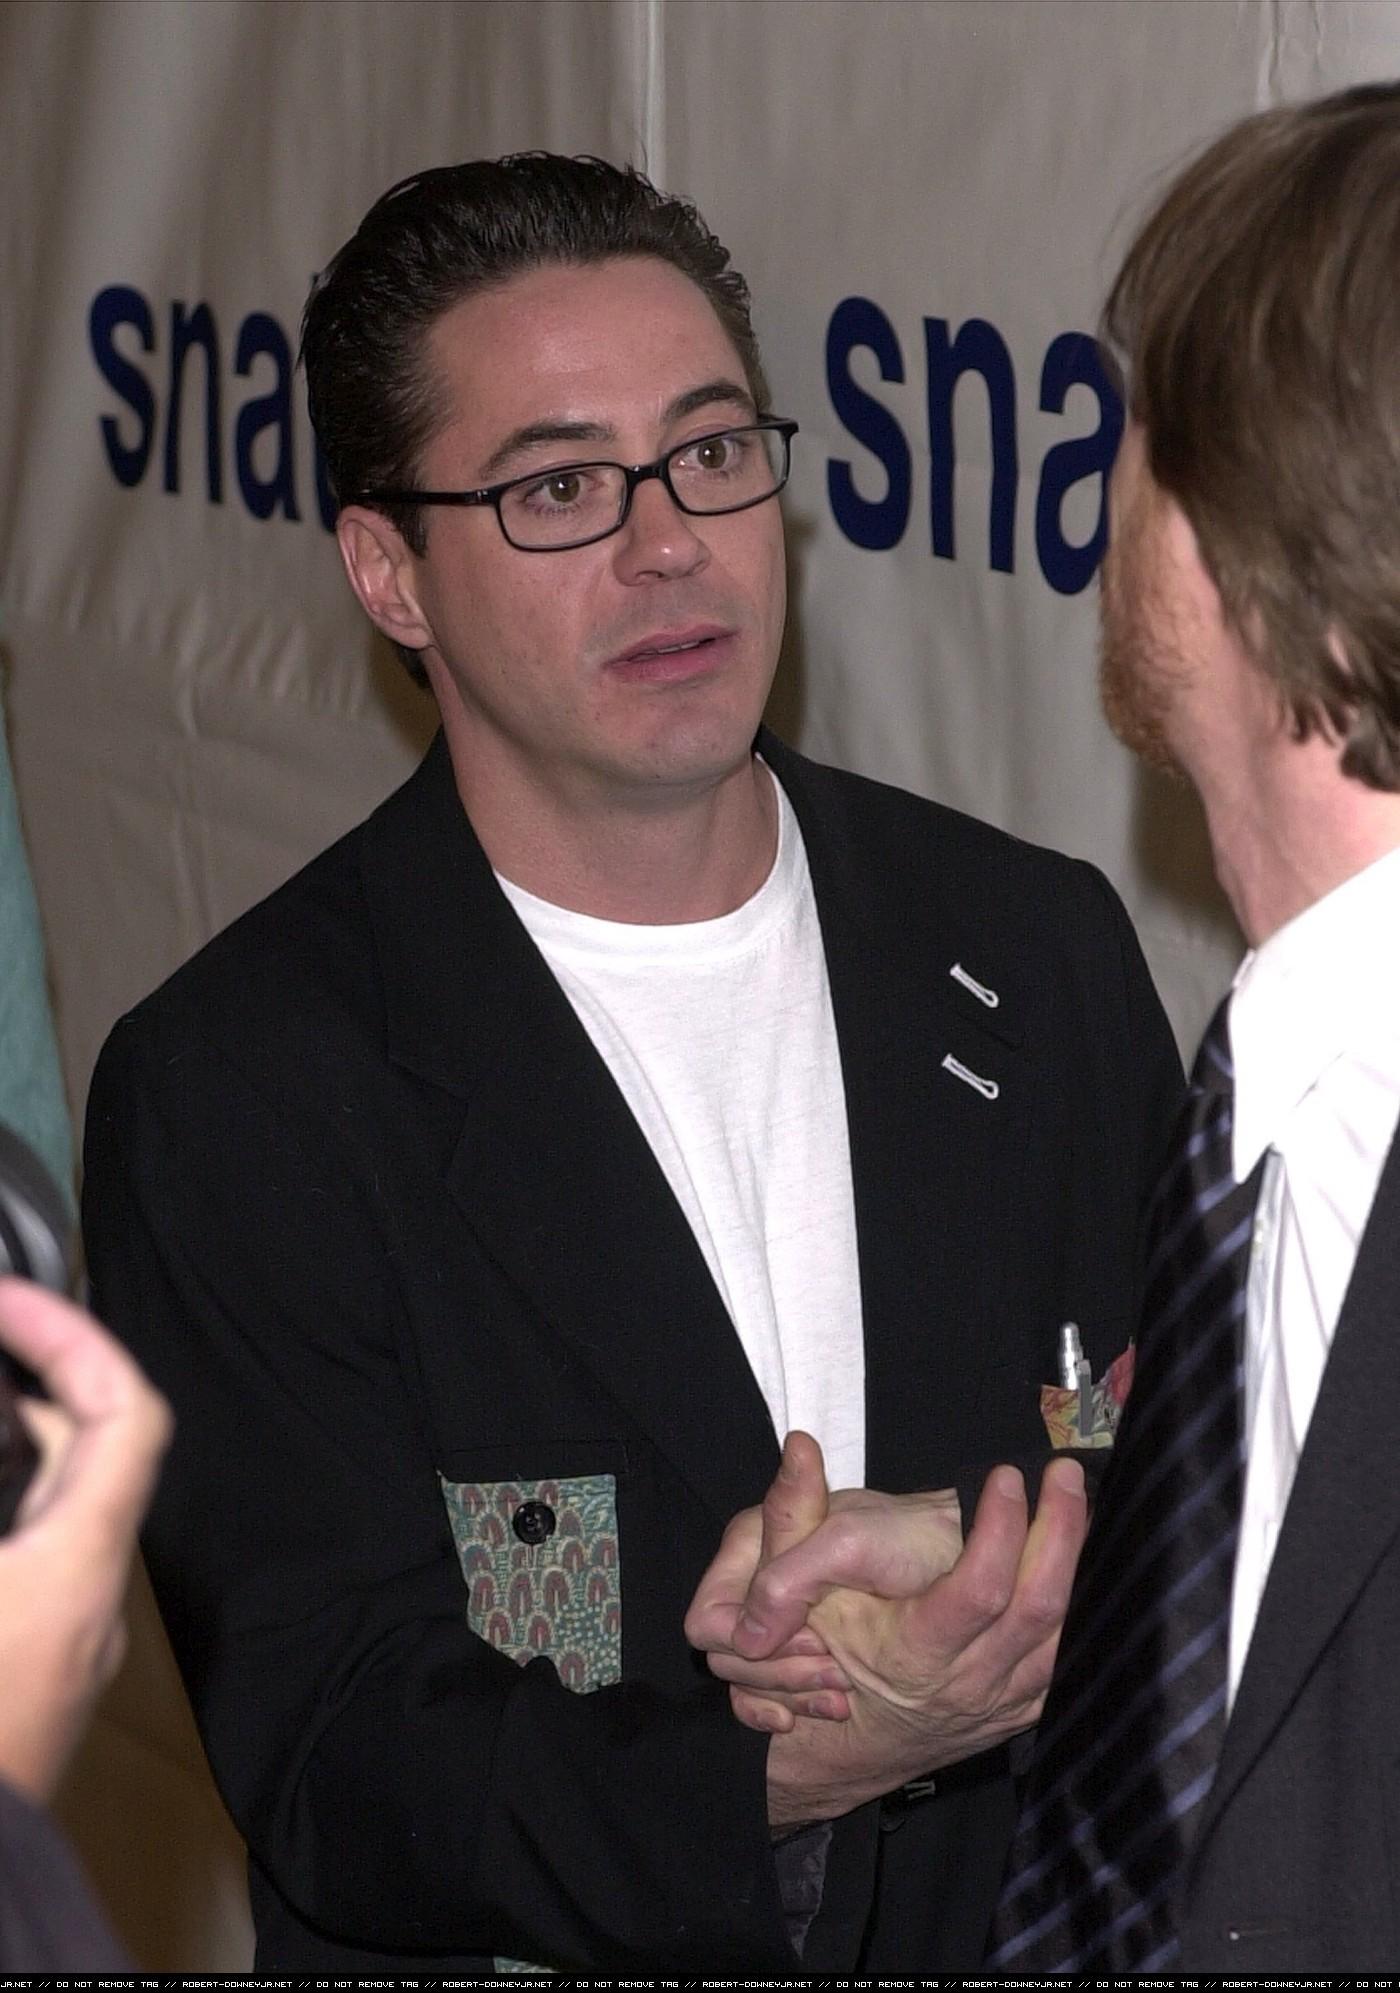 Snatch Premiere -19th January 2001